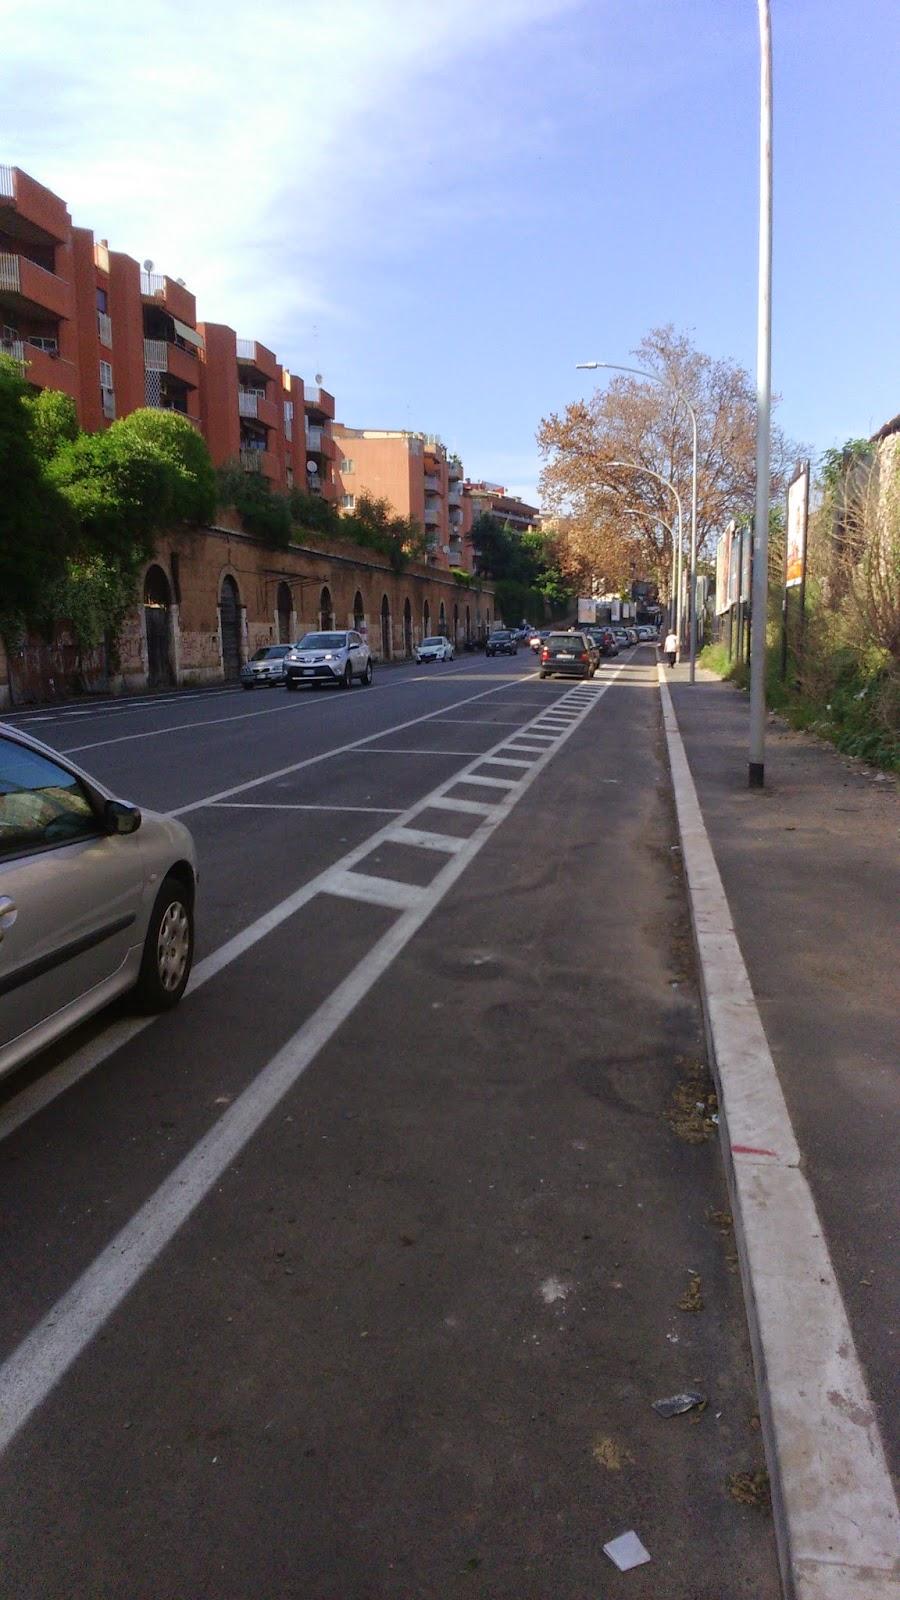 Ciclabili a roma piste ciclabili e ciclopedonali - Porta portese 2 ...